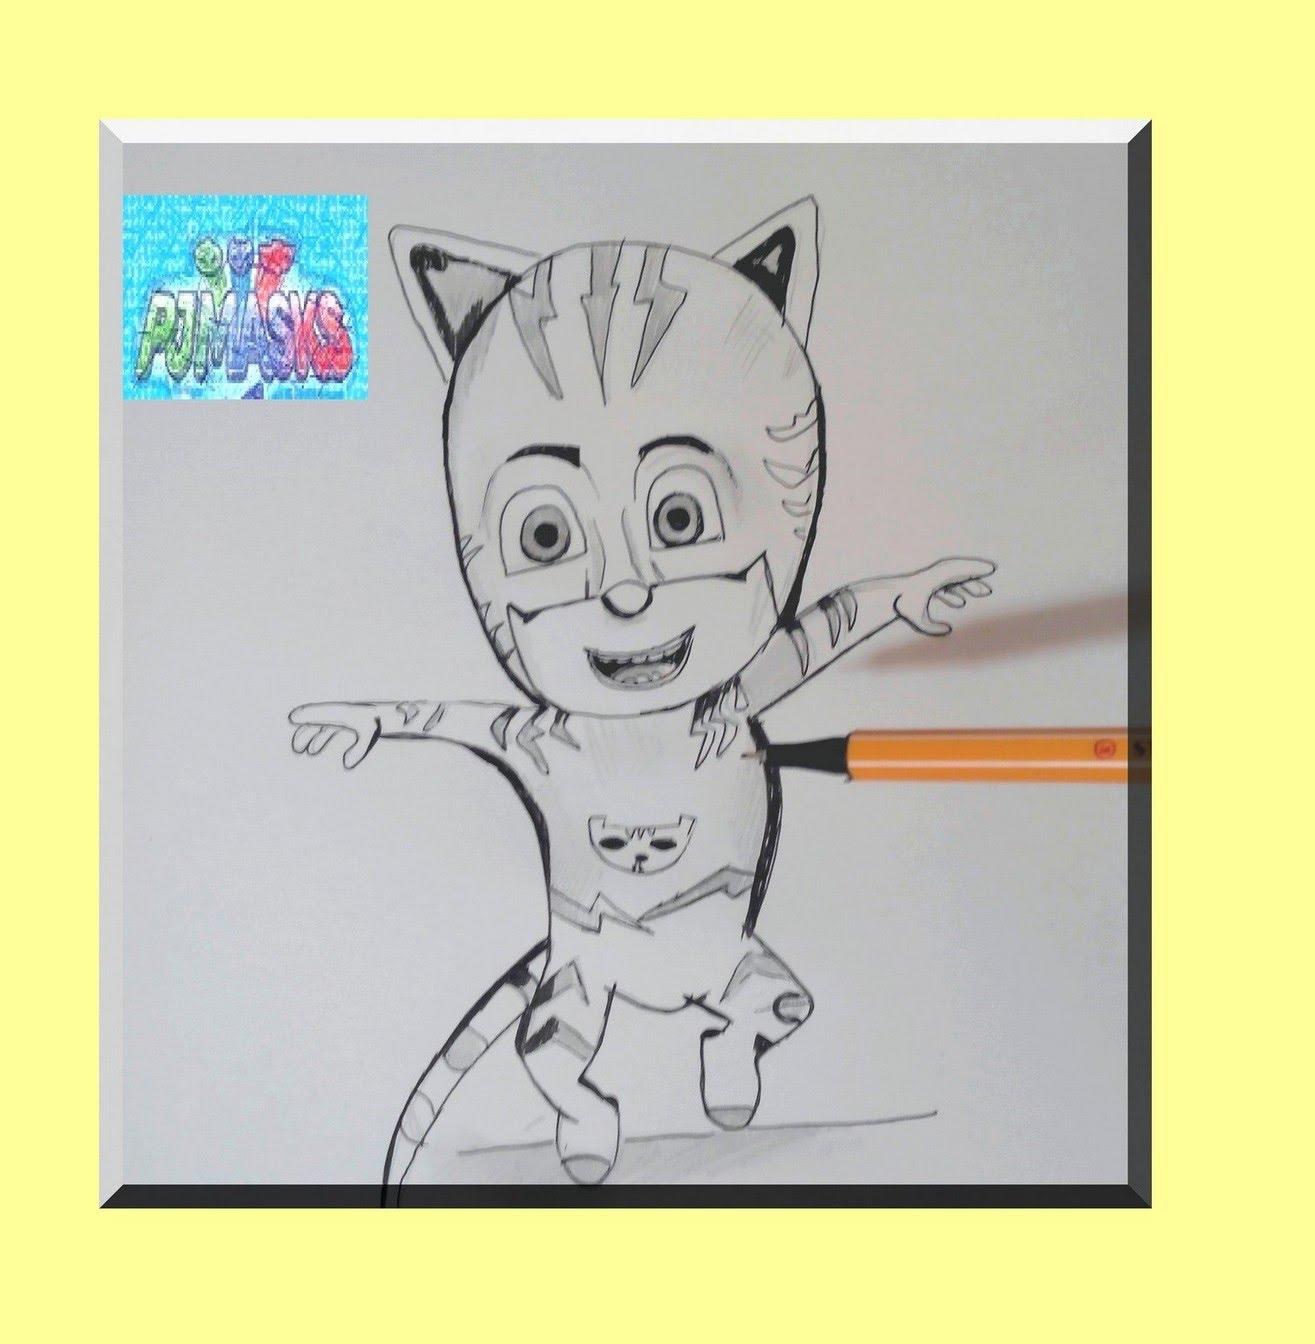 Drawn masks cat Catboy Pyjamasques to animès pj